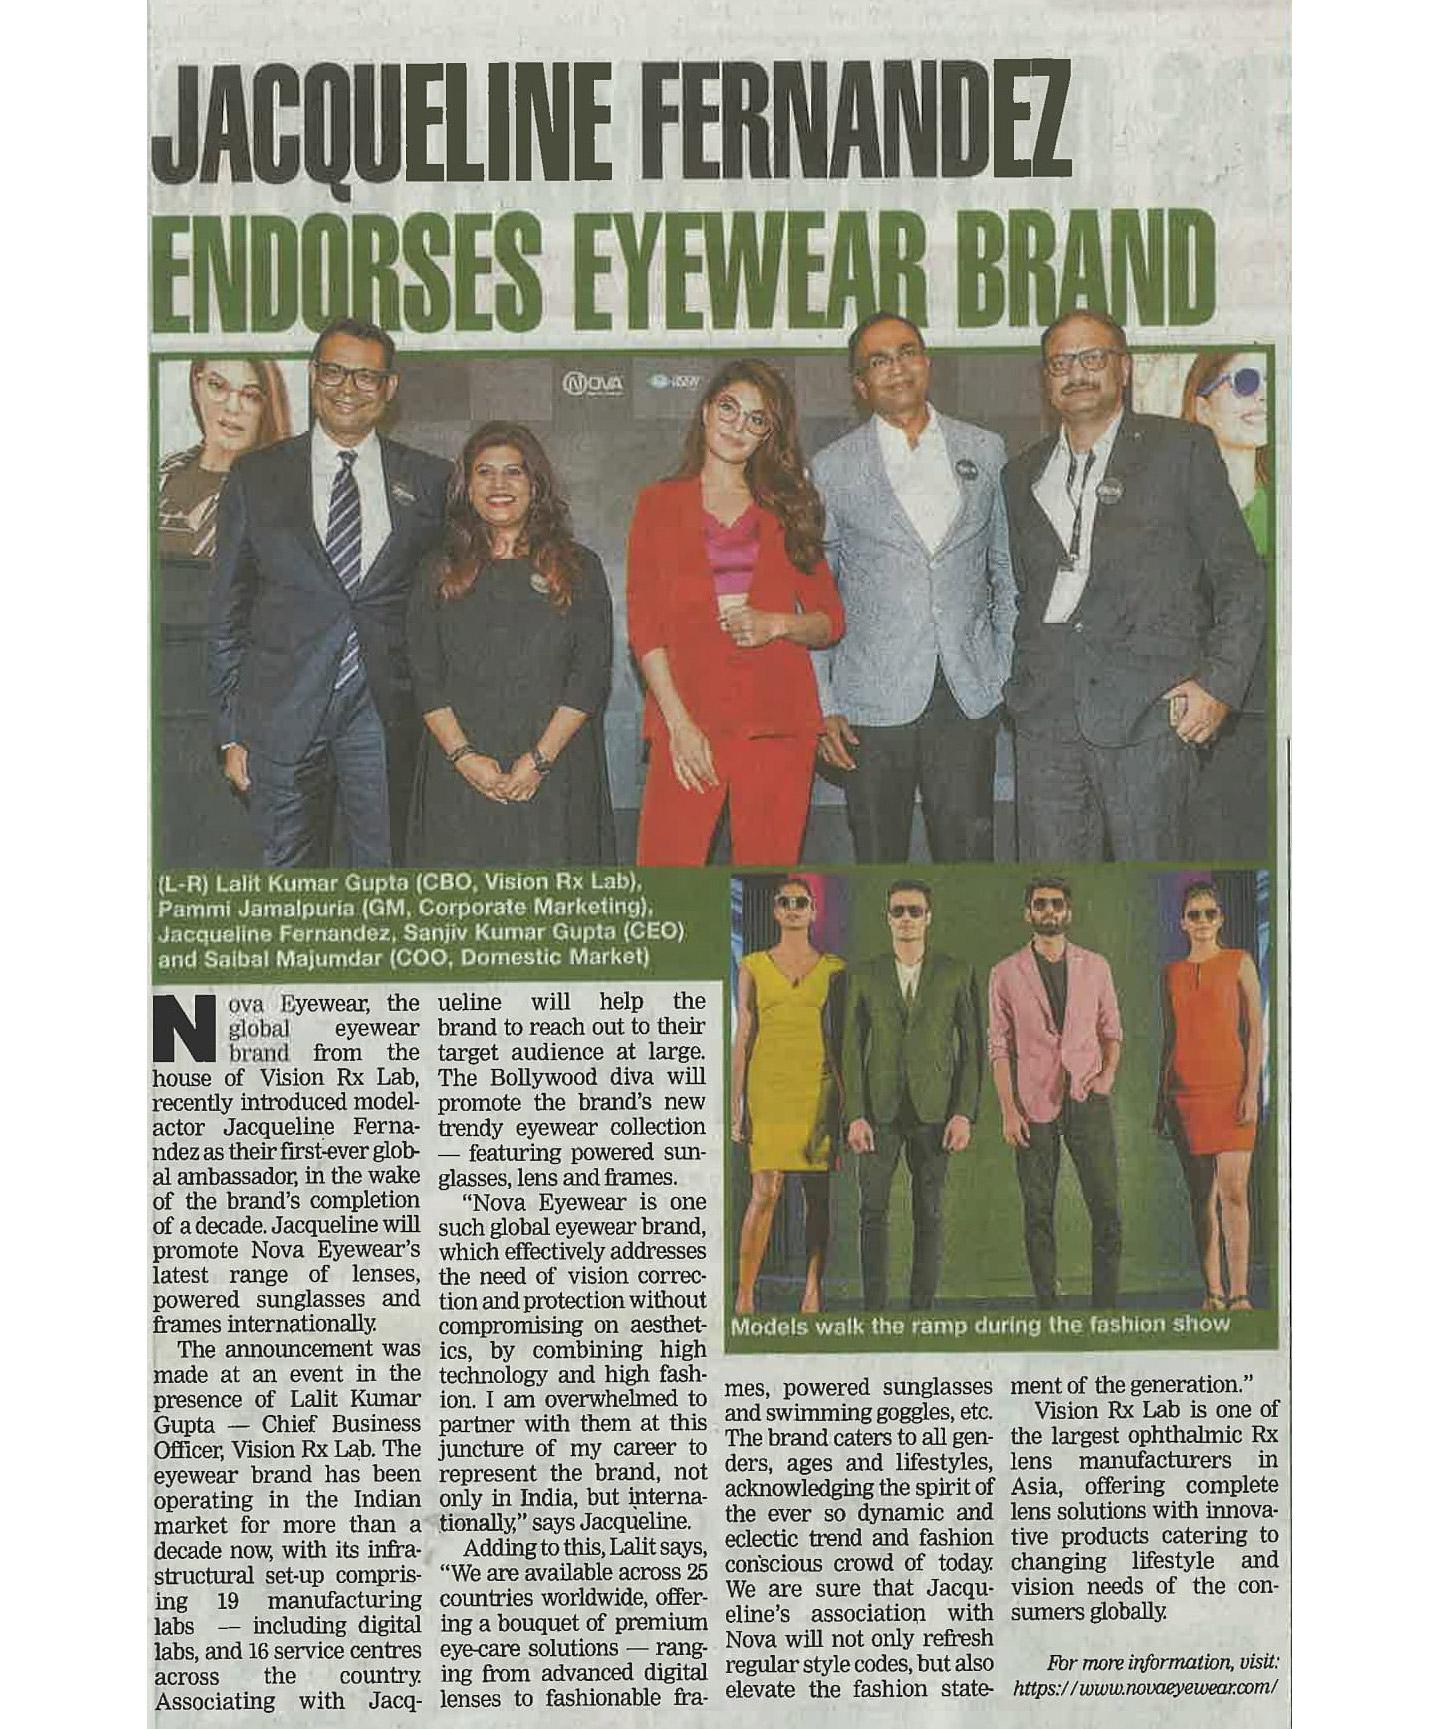 Jacqueline goes global with eyewear brand